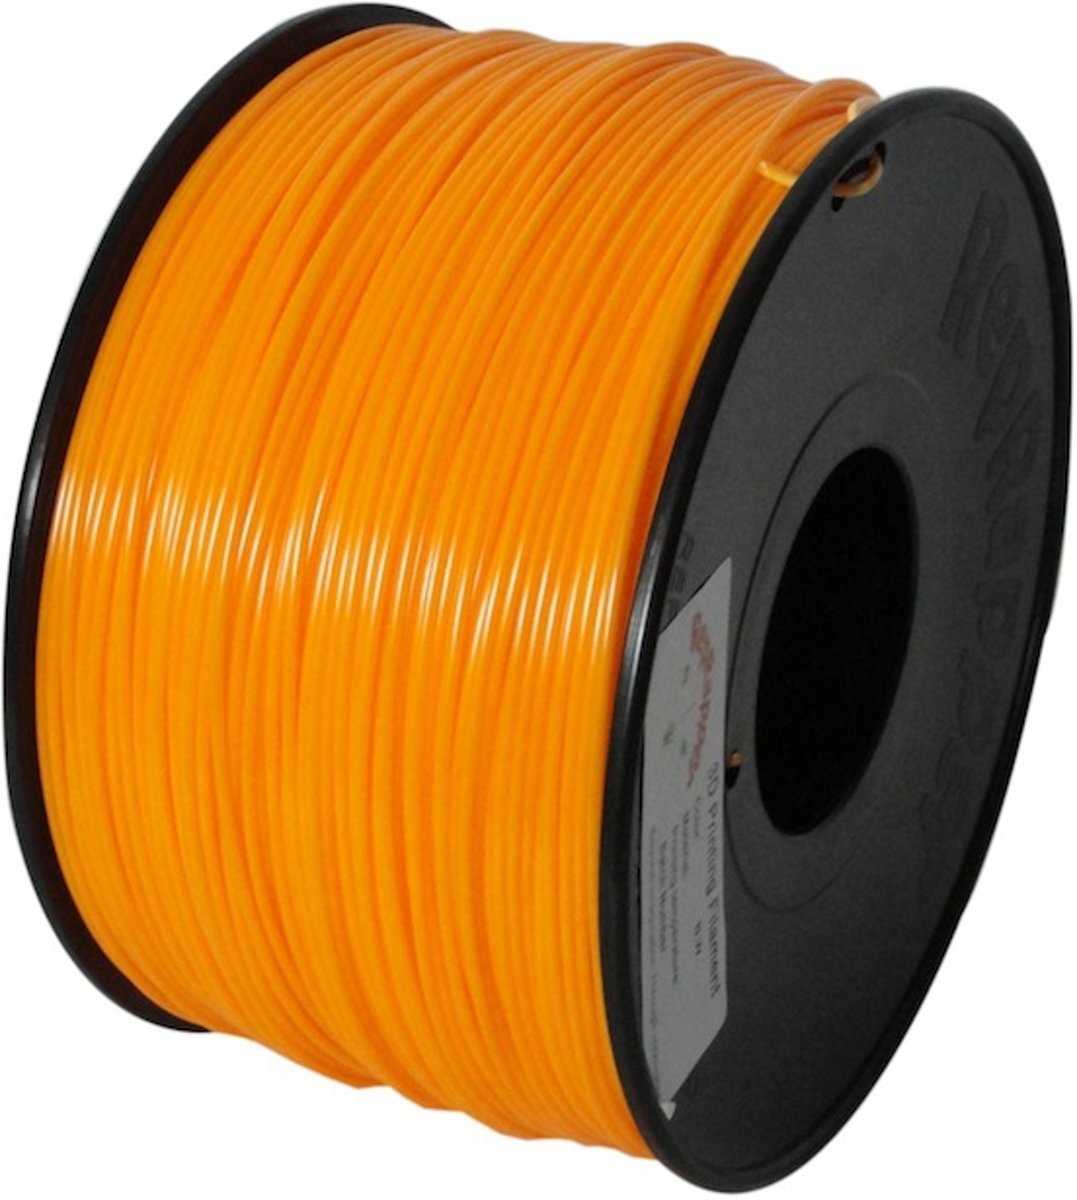 1.75mm oranje ABS filament